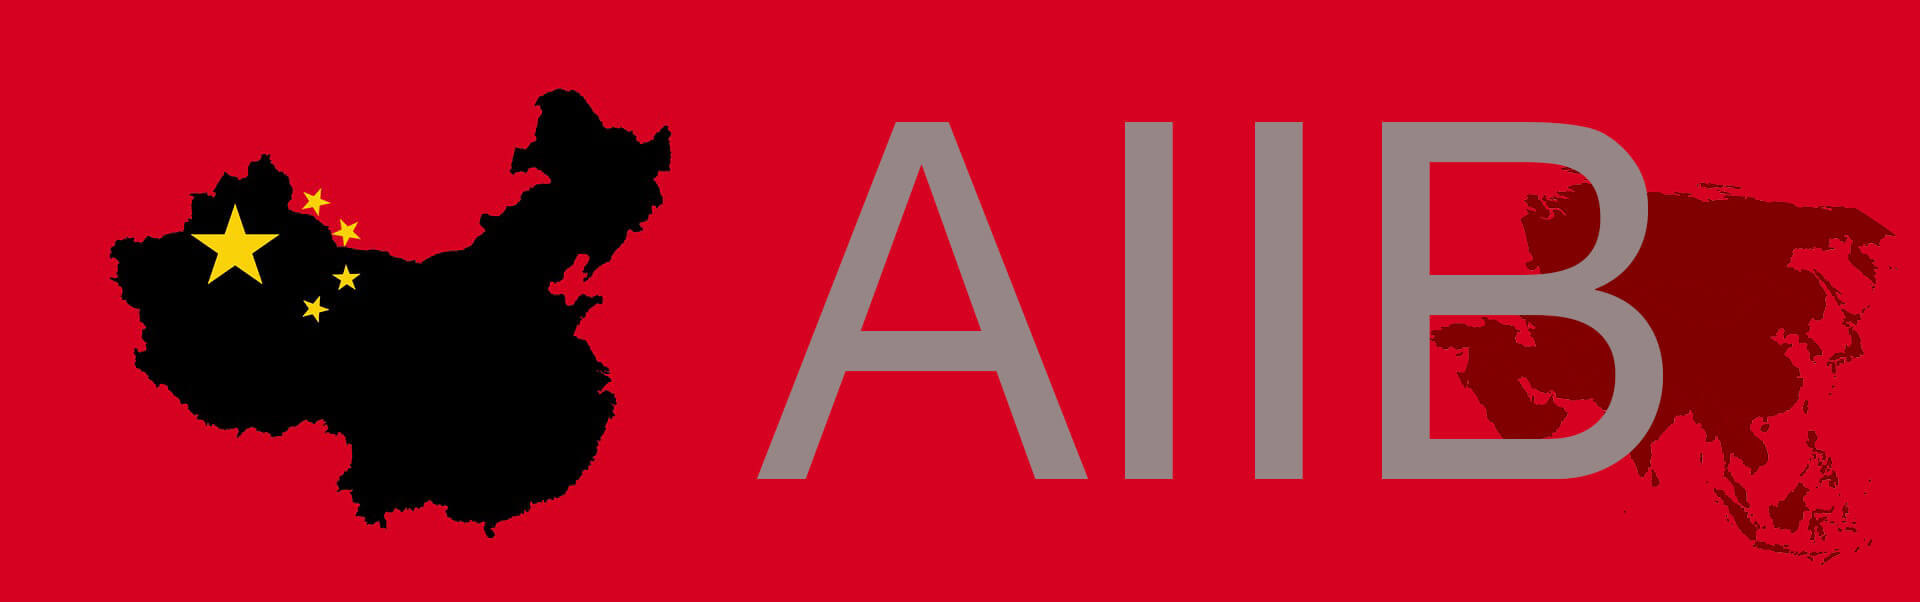 「AIIB」の最新状況【2020年版】 | 中国主導の「一帯一路」の影に隠れた実態とは?